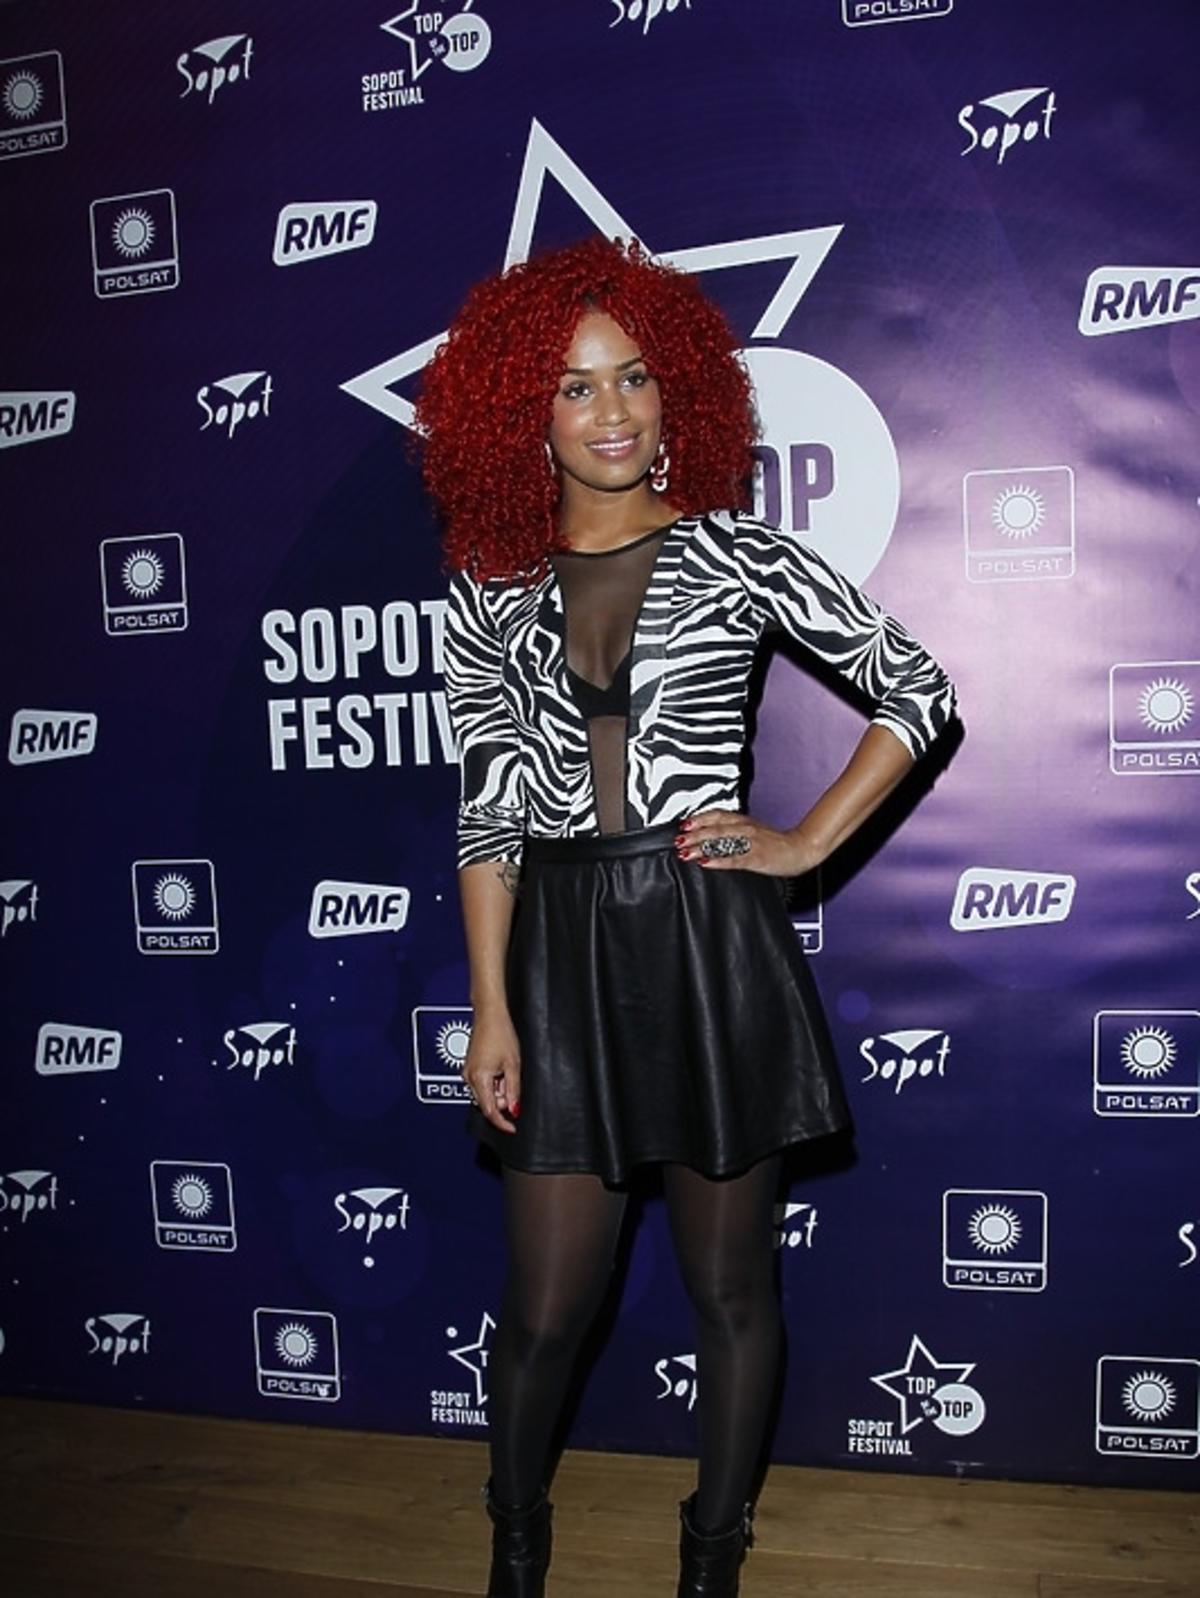 Sharon Doorson podczas konferencji Sopot Top of the Top Festival 2013